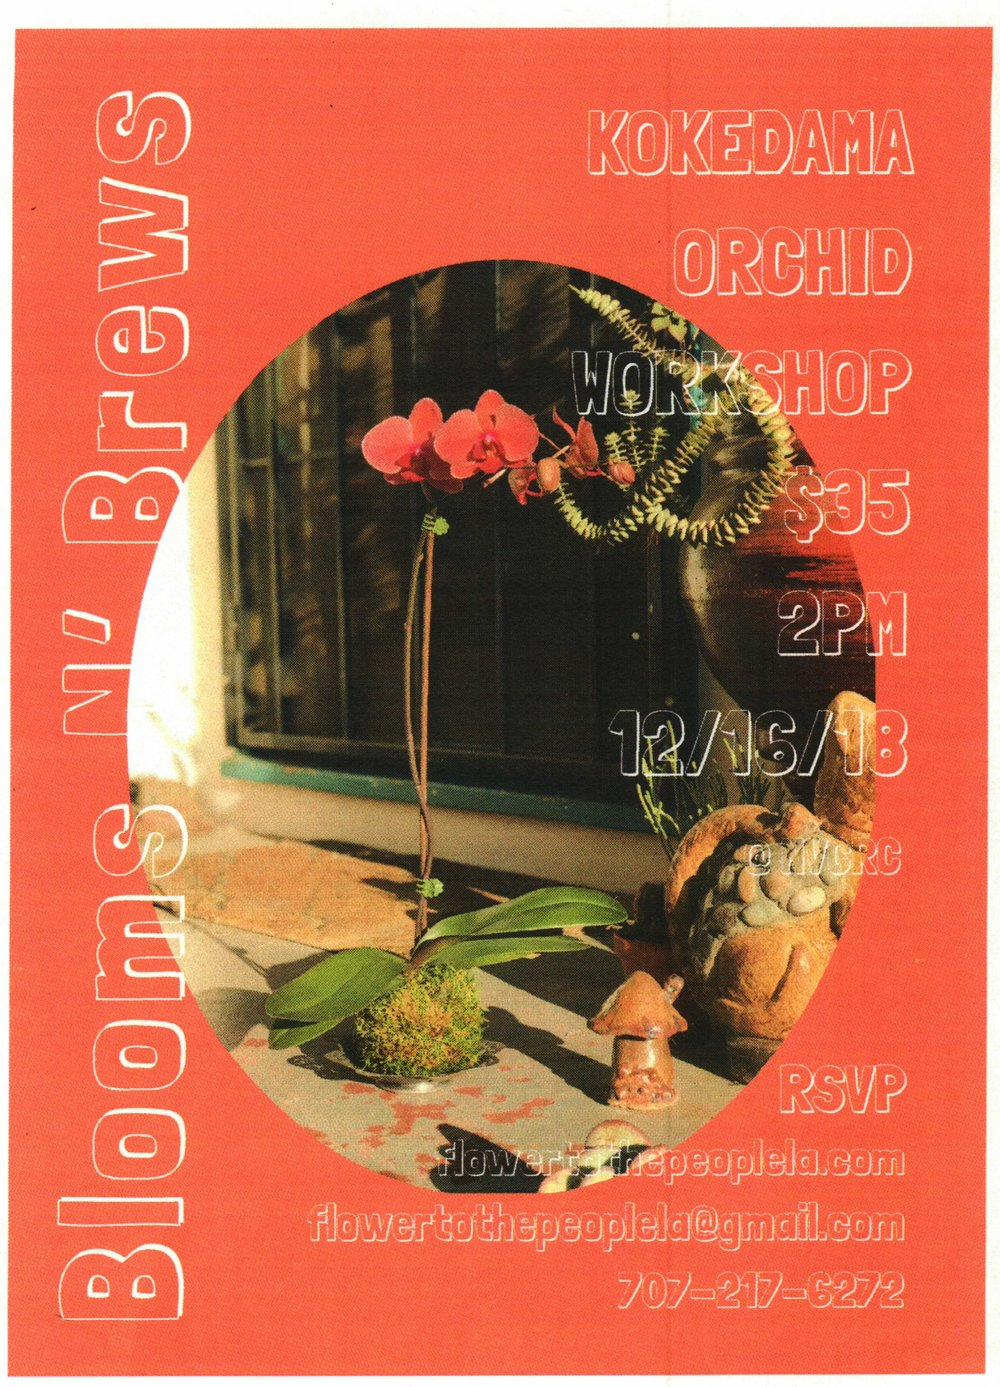 Kokedama Orchid.JPG